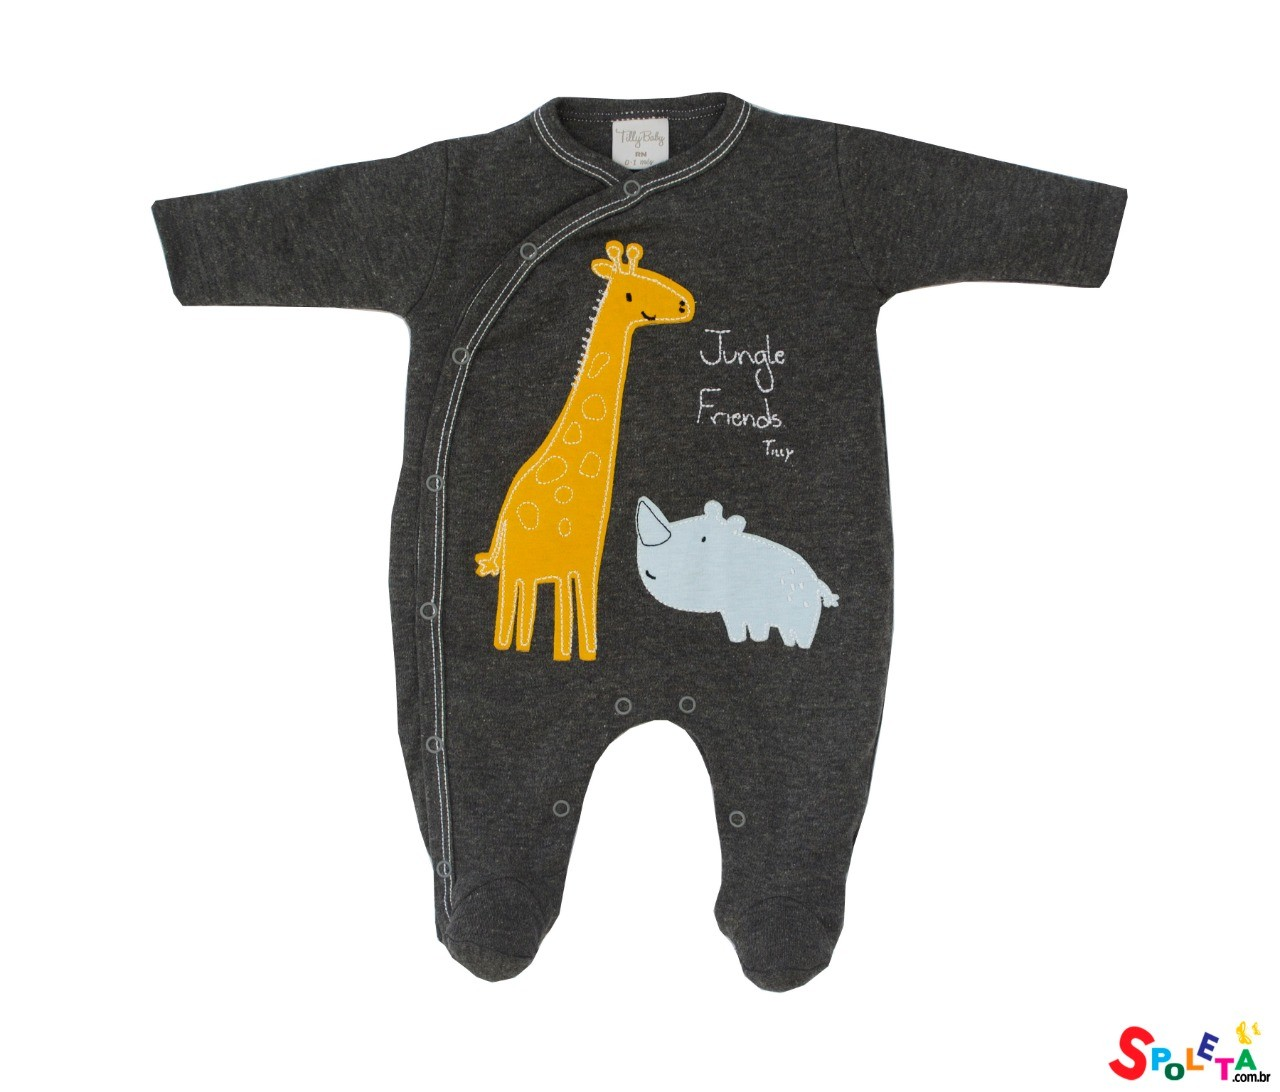 Macacão Infantil Masculino Longo Girafa Tilly Baby